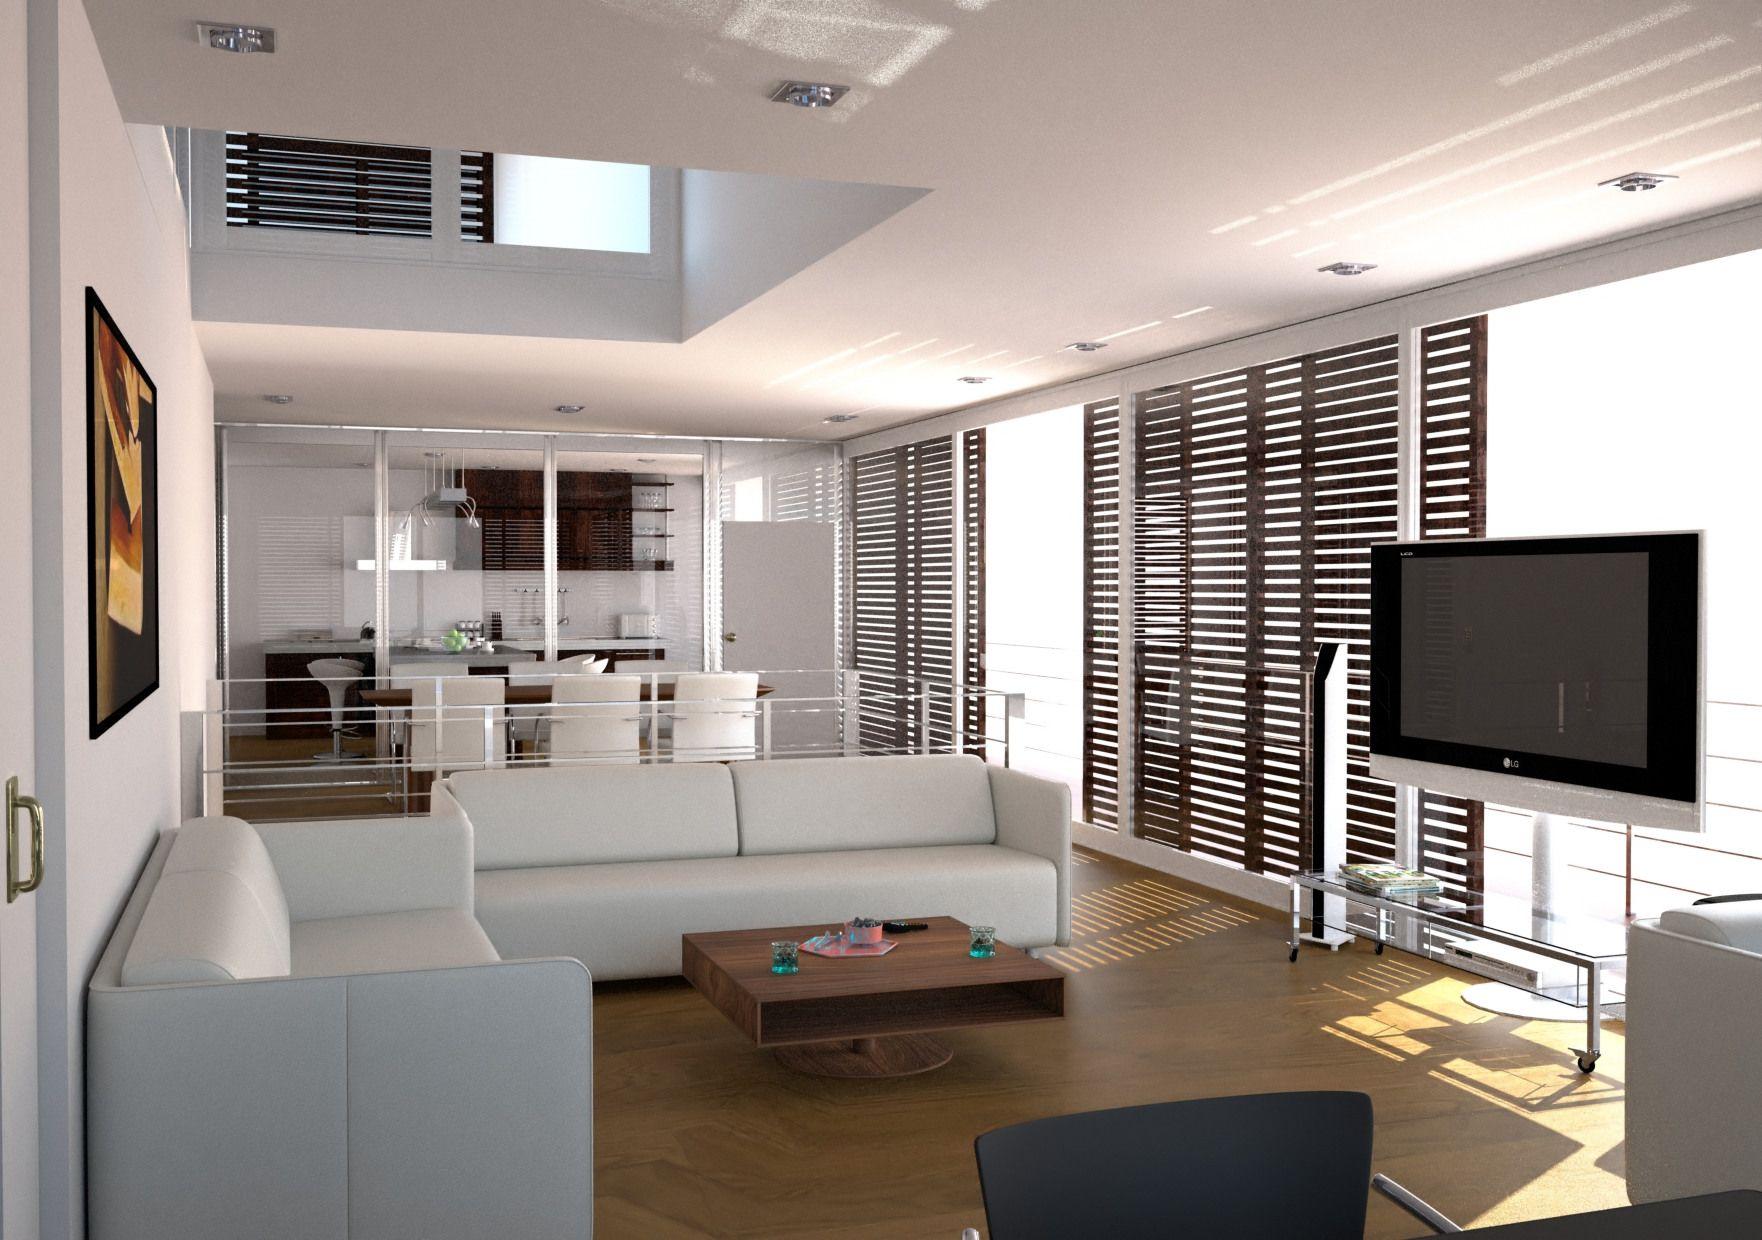 Interior Designing Of Home | AmazingPict.com - Wallpapers | Pinterest